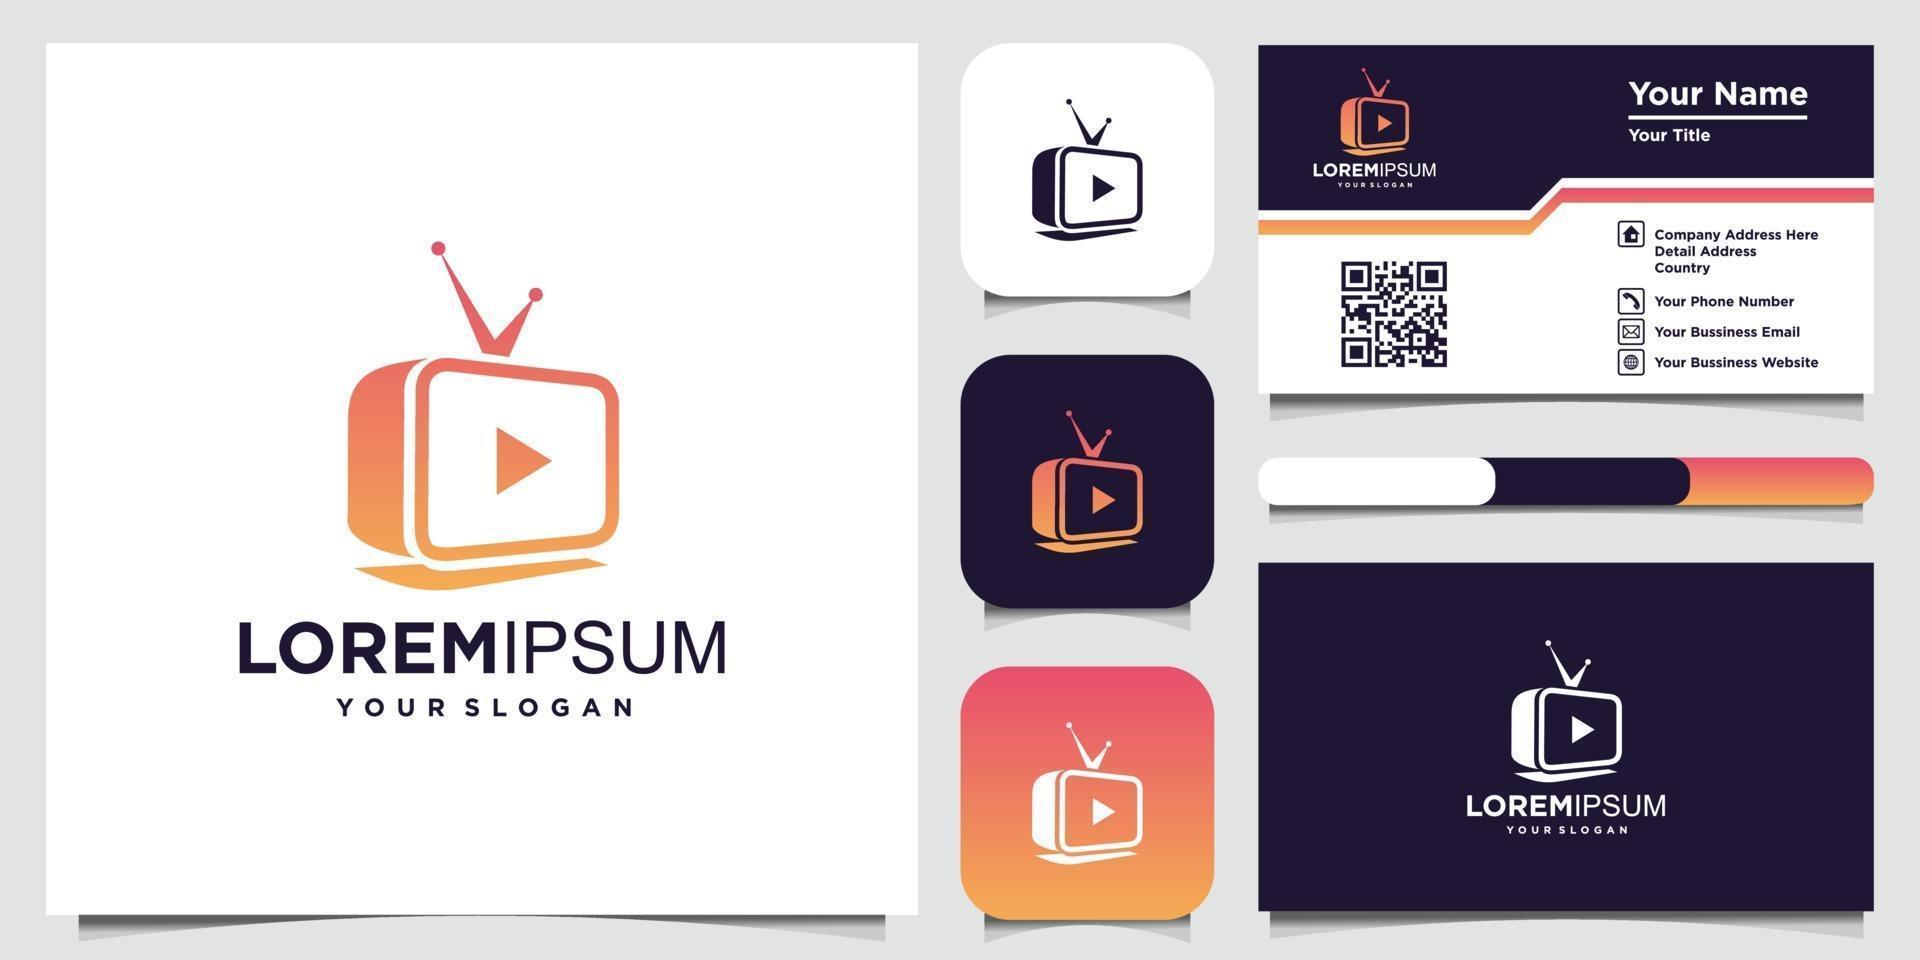 Creative tv concept logo design template and business card vector